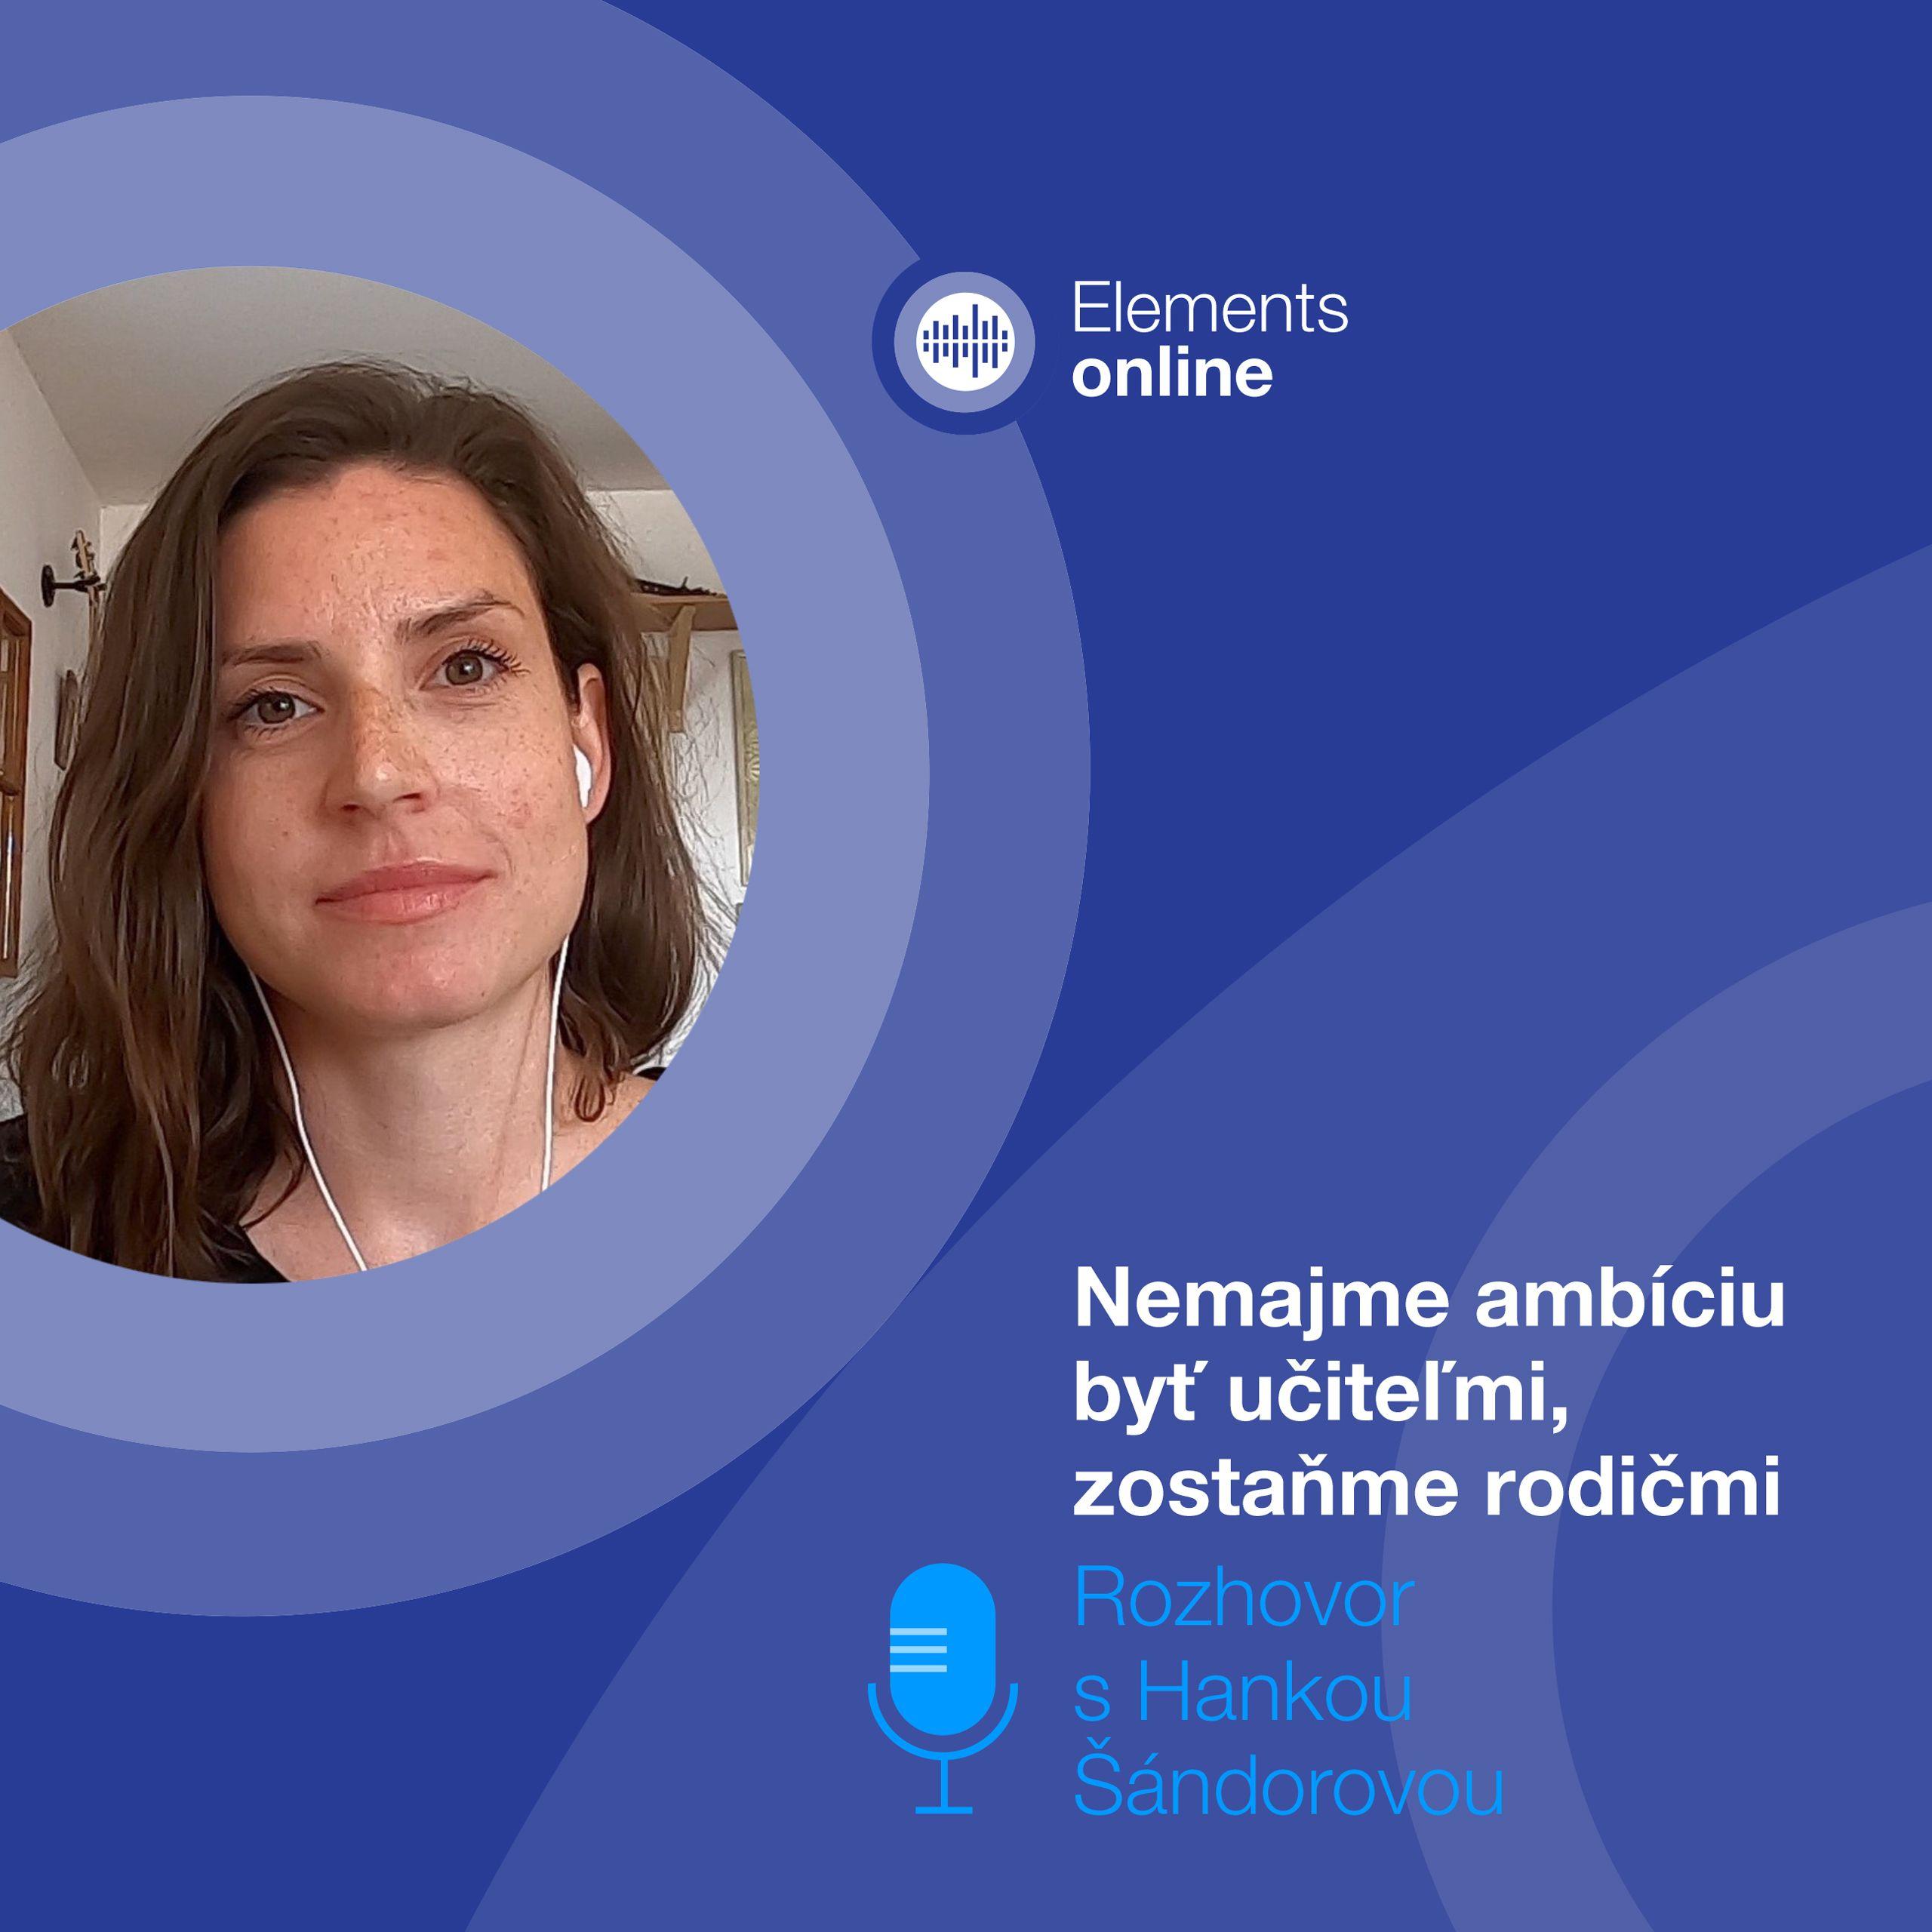 pe-banner-rozhovor-hanka-sandorova-2020-04-29-1920x1920@2x-c